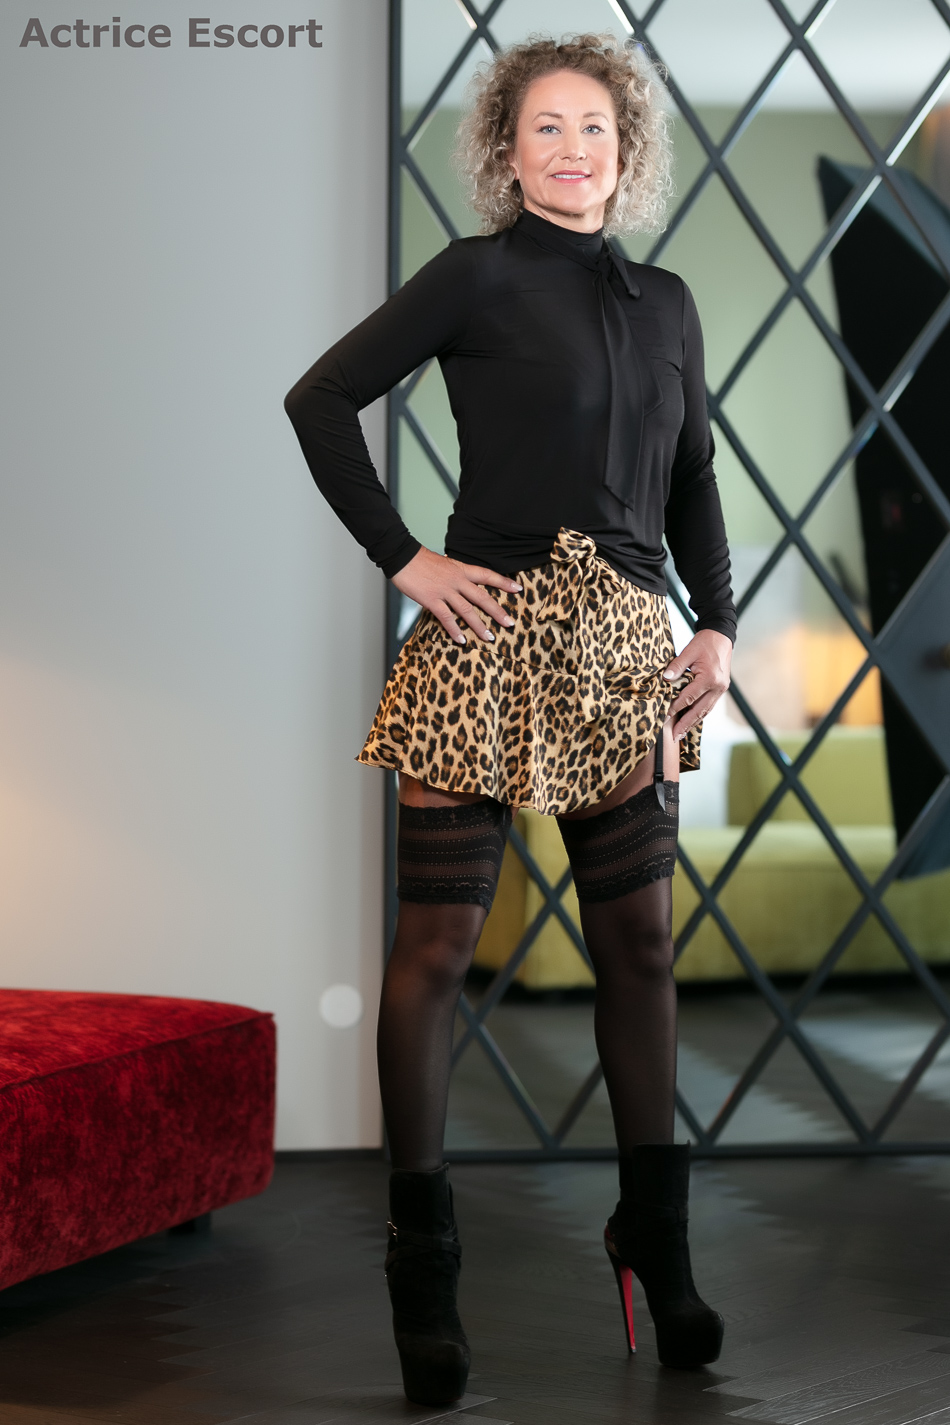 Lexy-Escortservice-Mannheim_frivoles_Outfit_mit_Louboutin_Stiefeletten